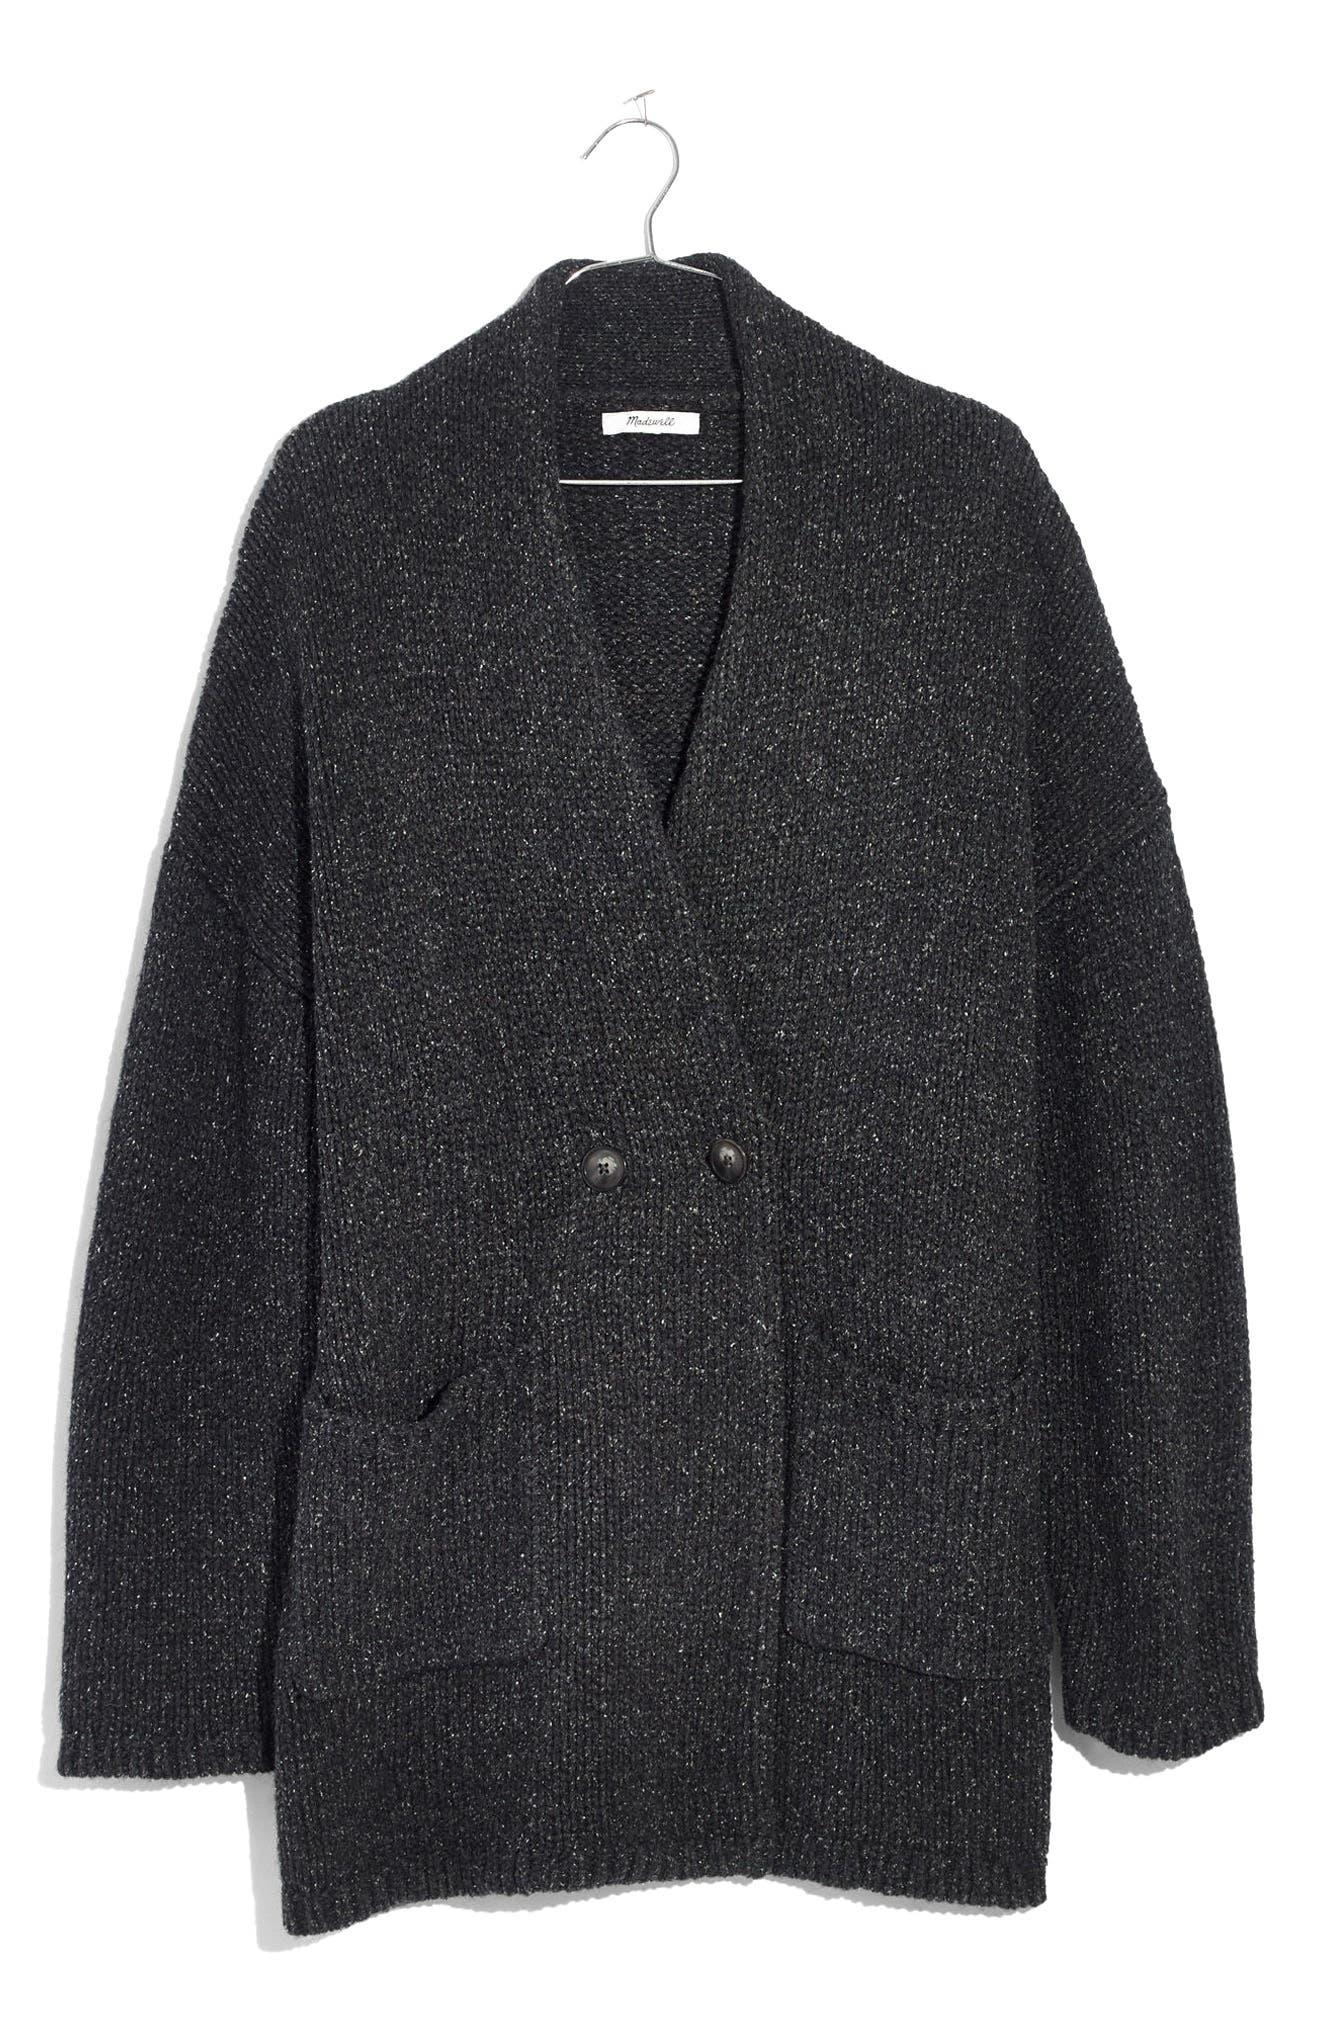 Glenhill Sweater Coat,                             Alternate thumbnail 4, color,                             Ashland Slate